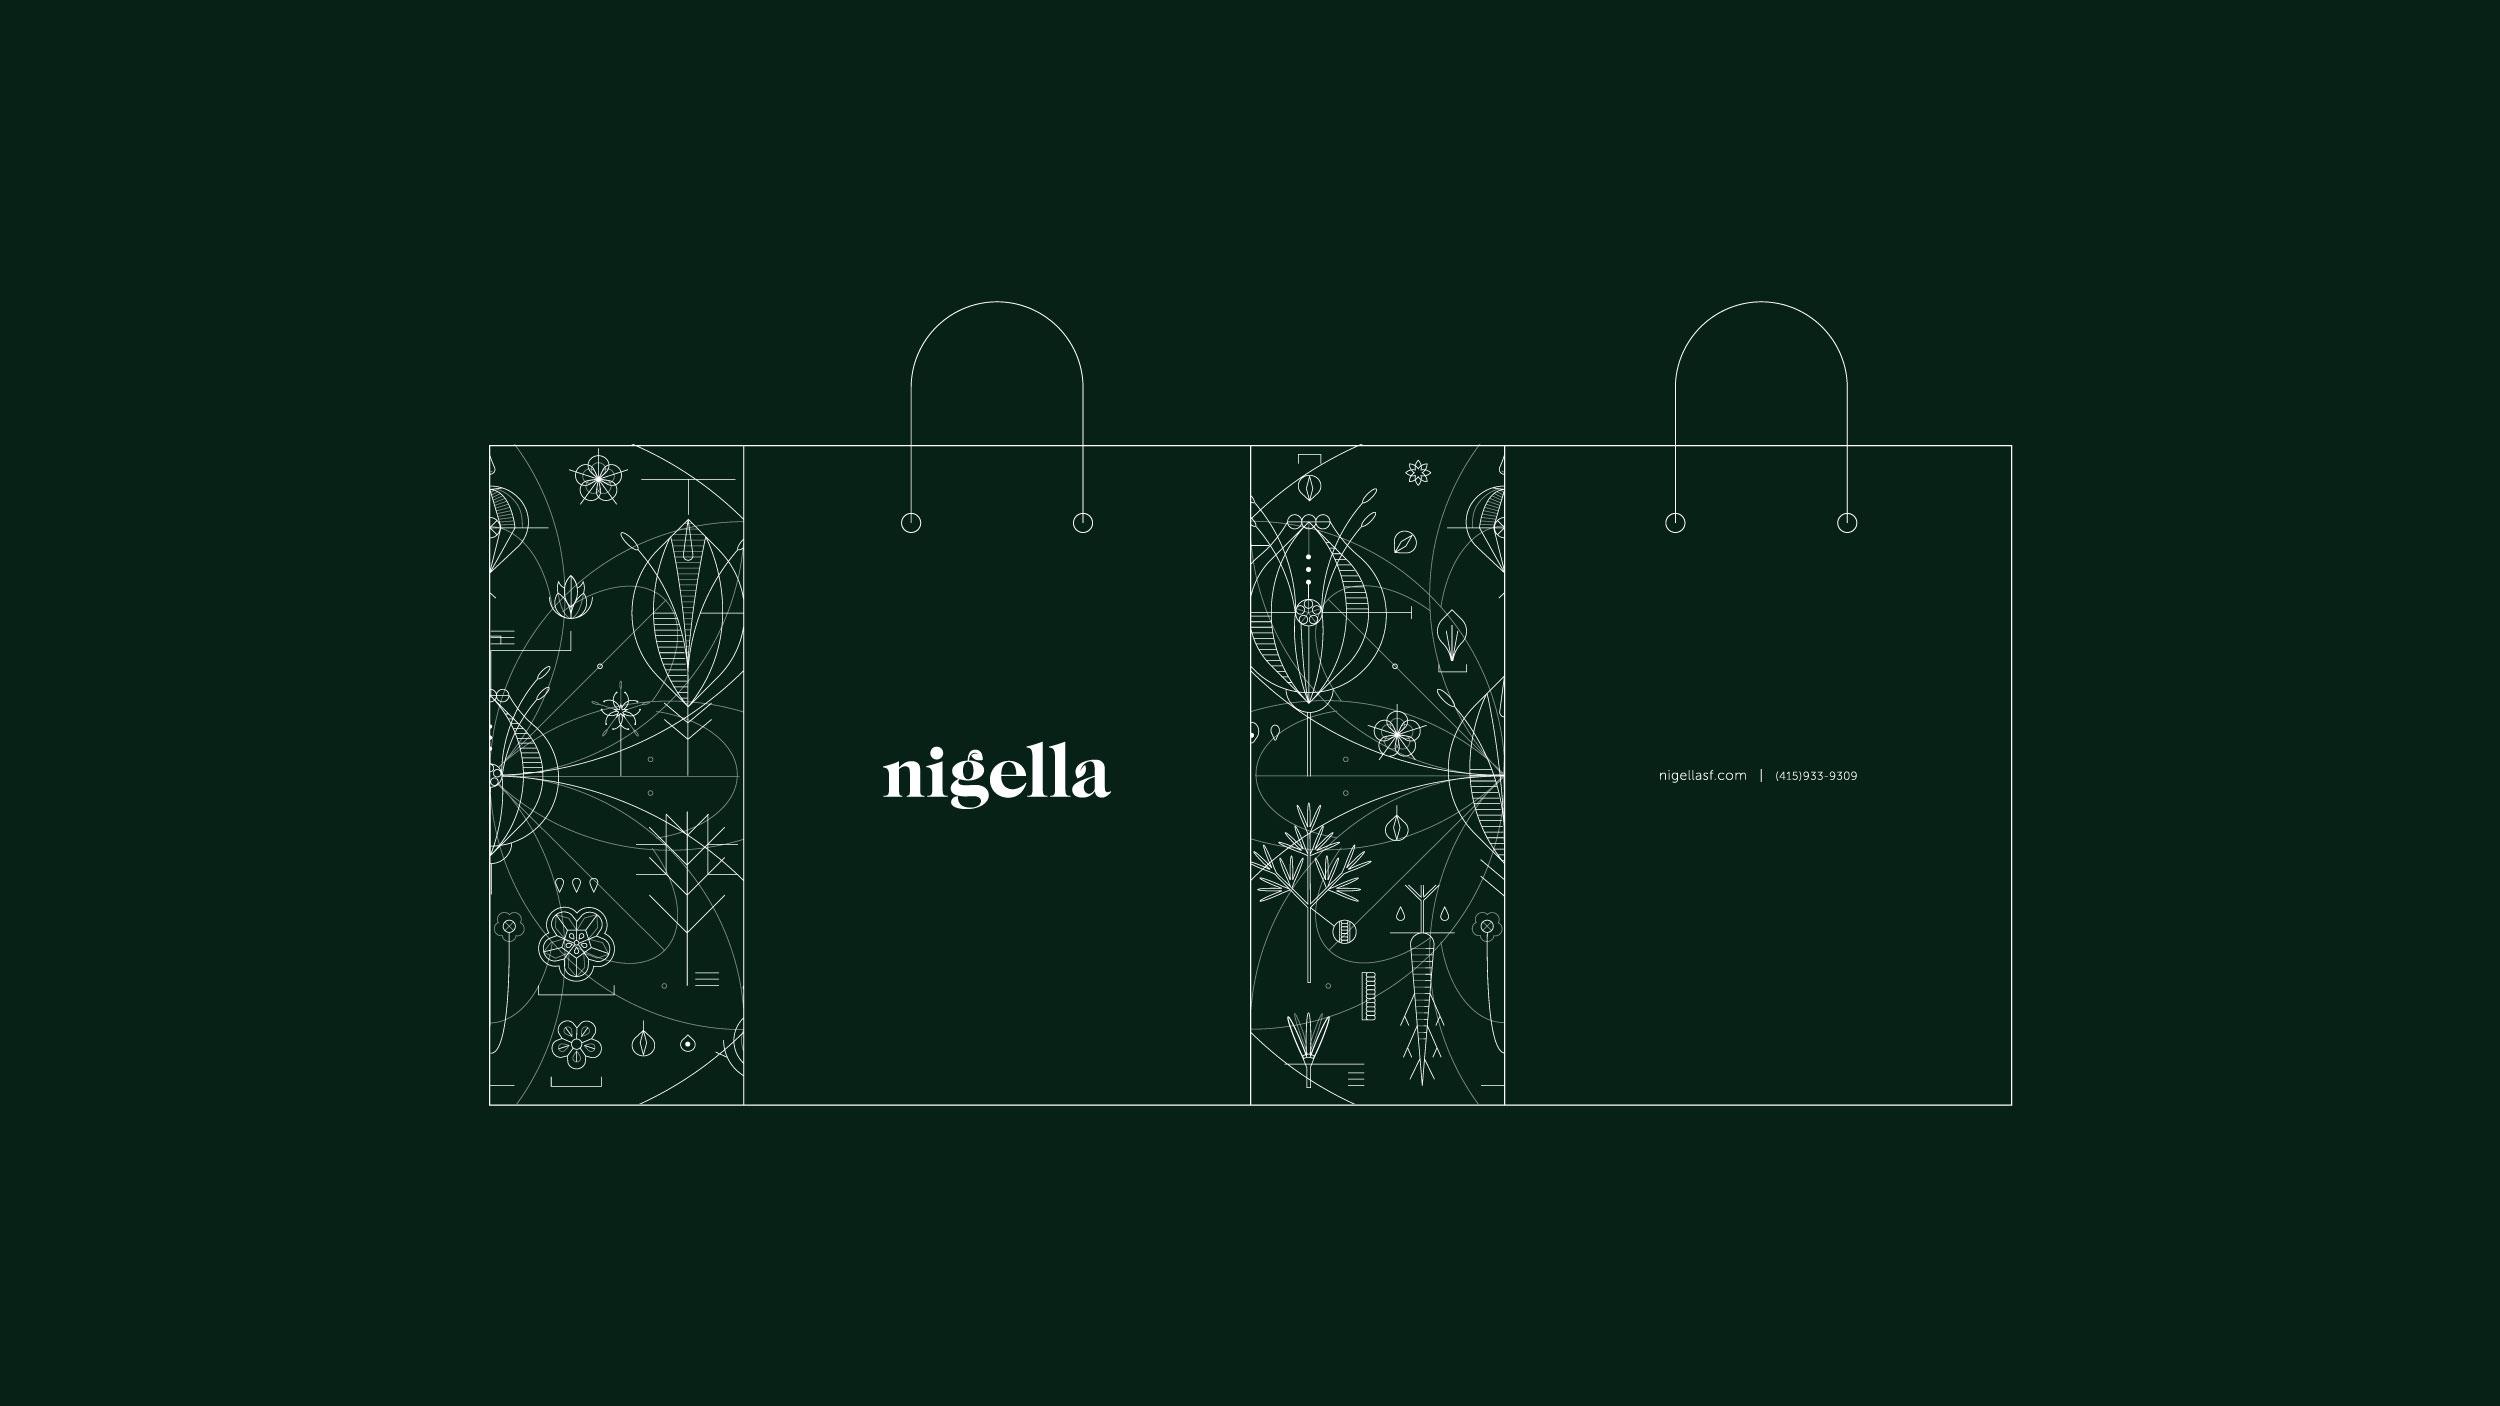 Anastasia-Itkina-Nigella-31.jpg